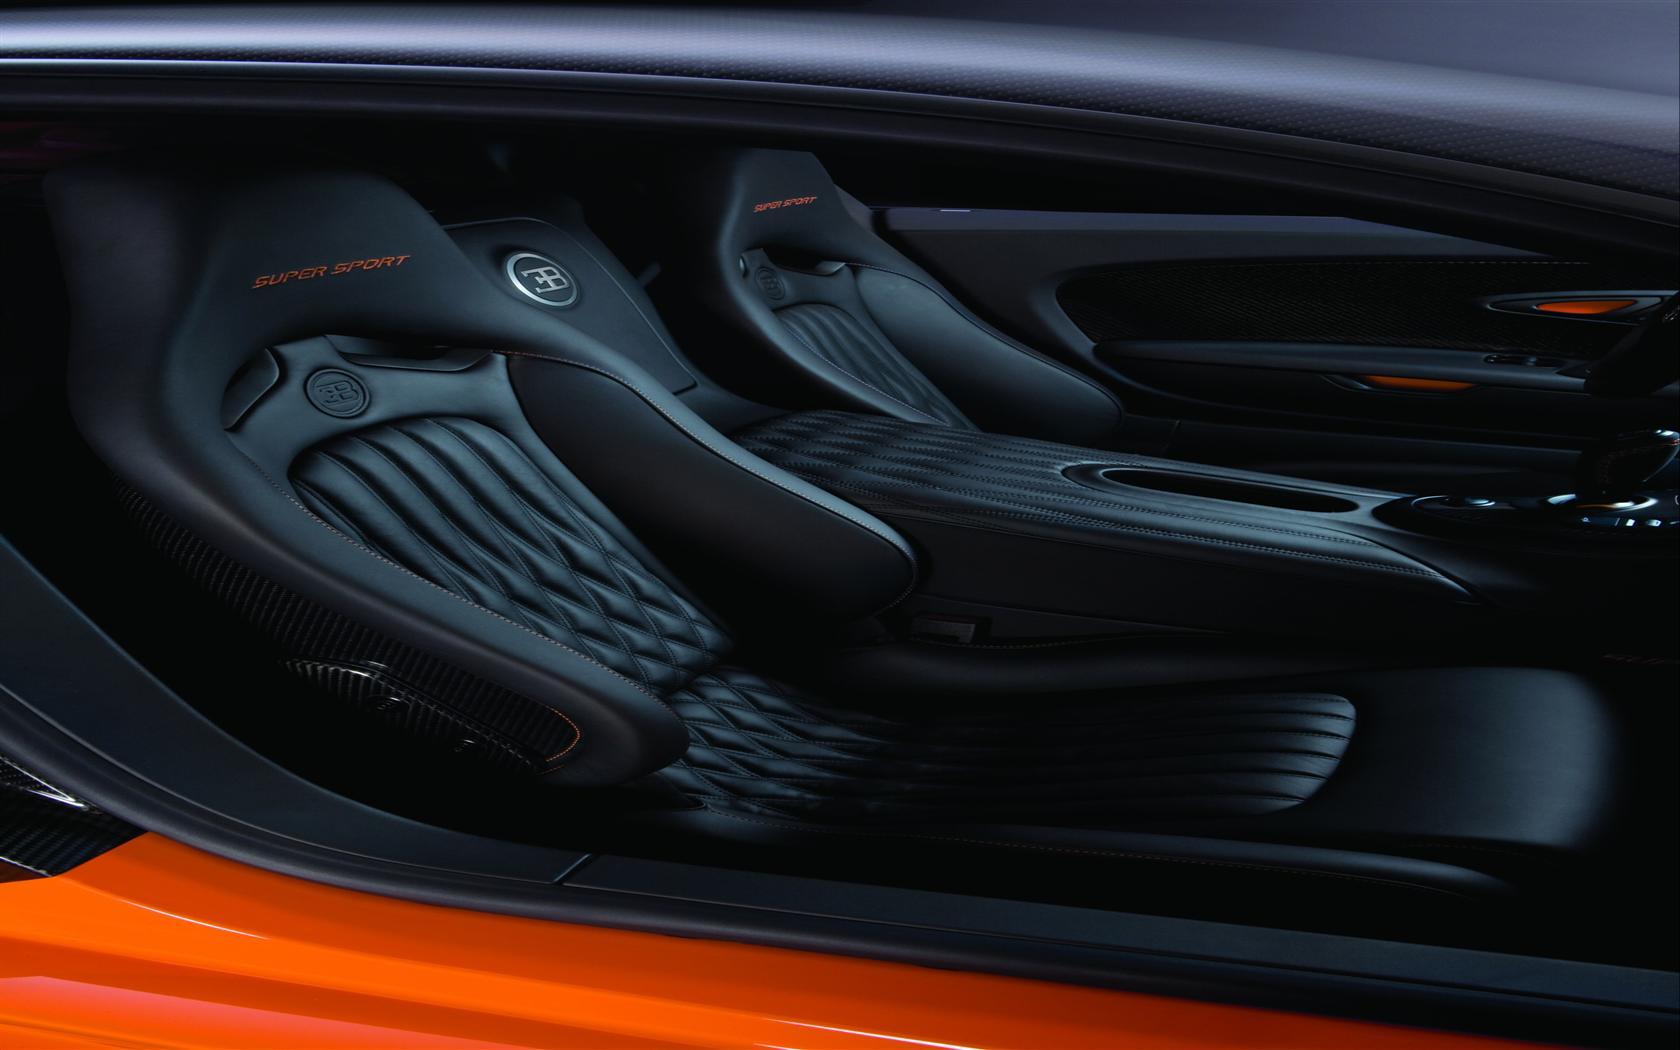 2013 bugatti veyron super sport price autos post. Black Bedroom Furniture Sets. Home Design Ideas